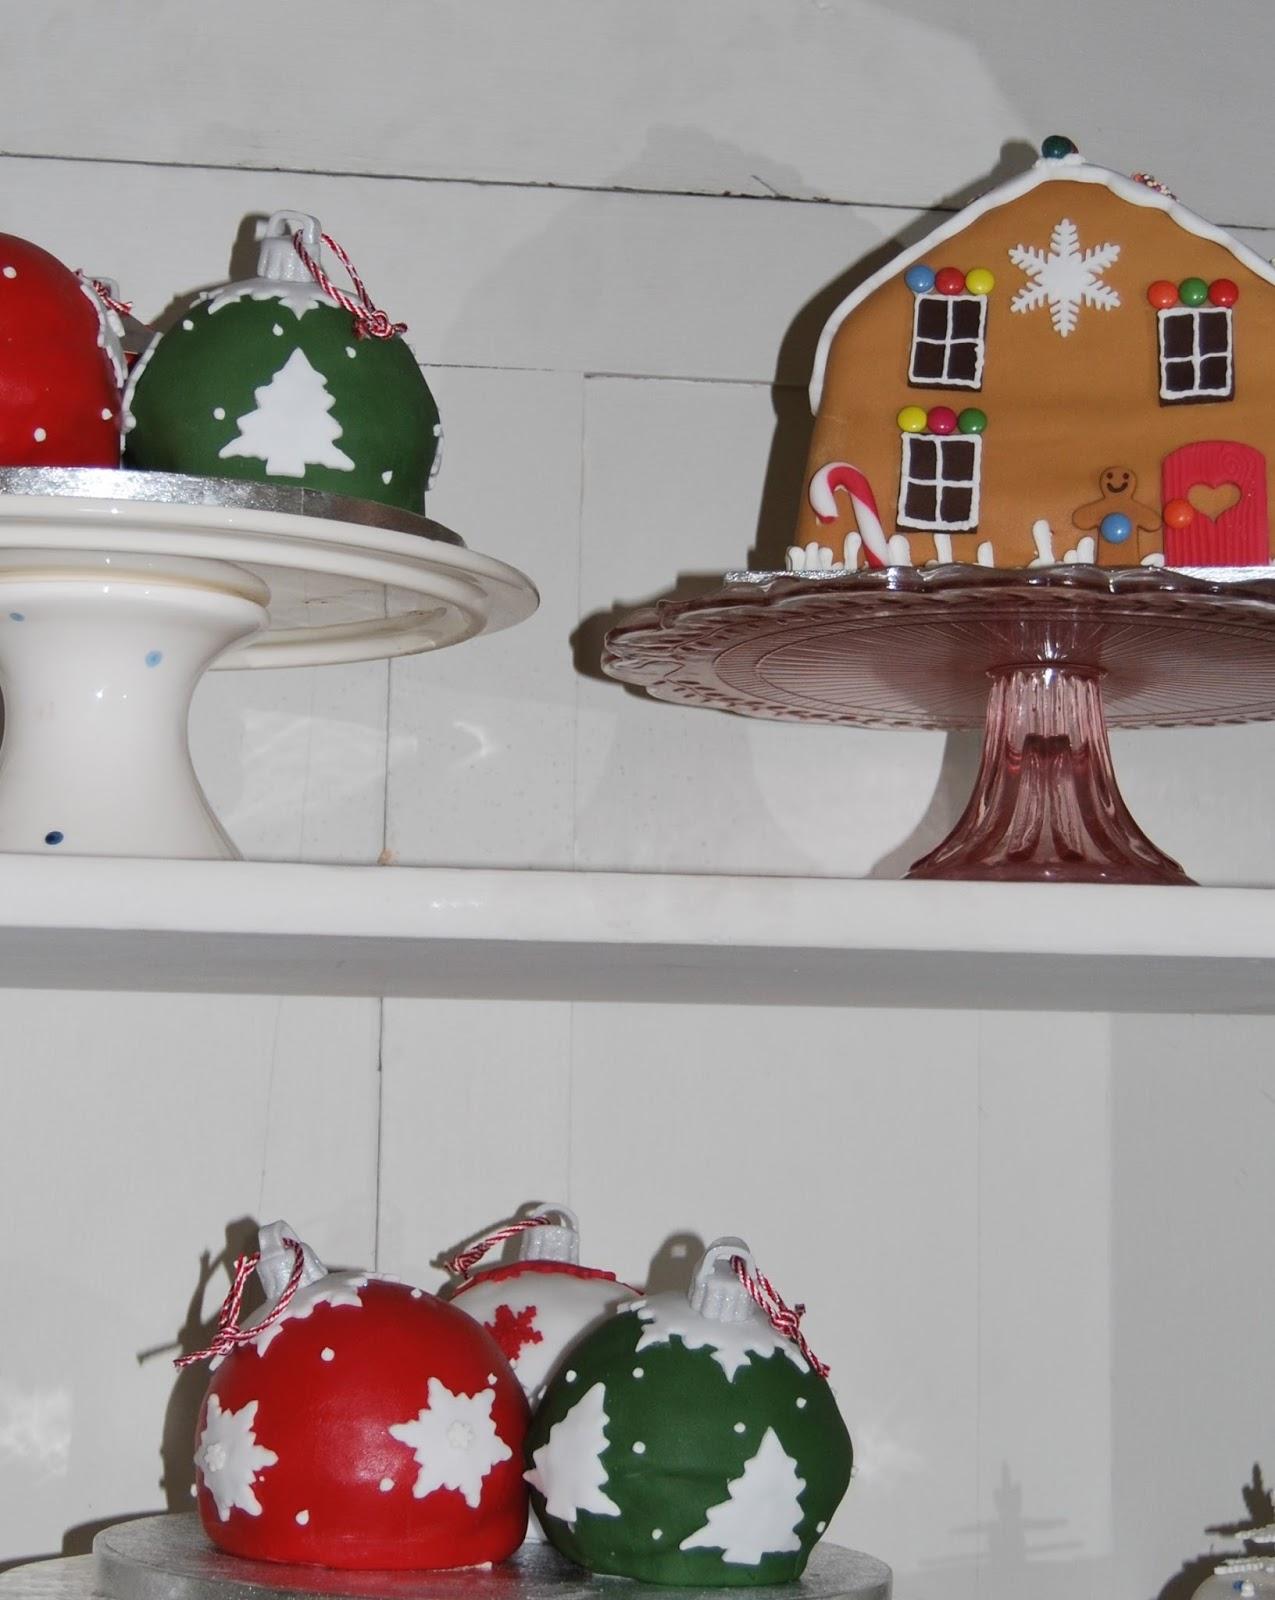 Christmas pudding, Waitrose Christmas 2015, photo by ModernBricaBrac